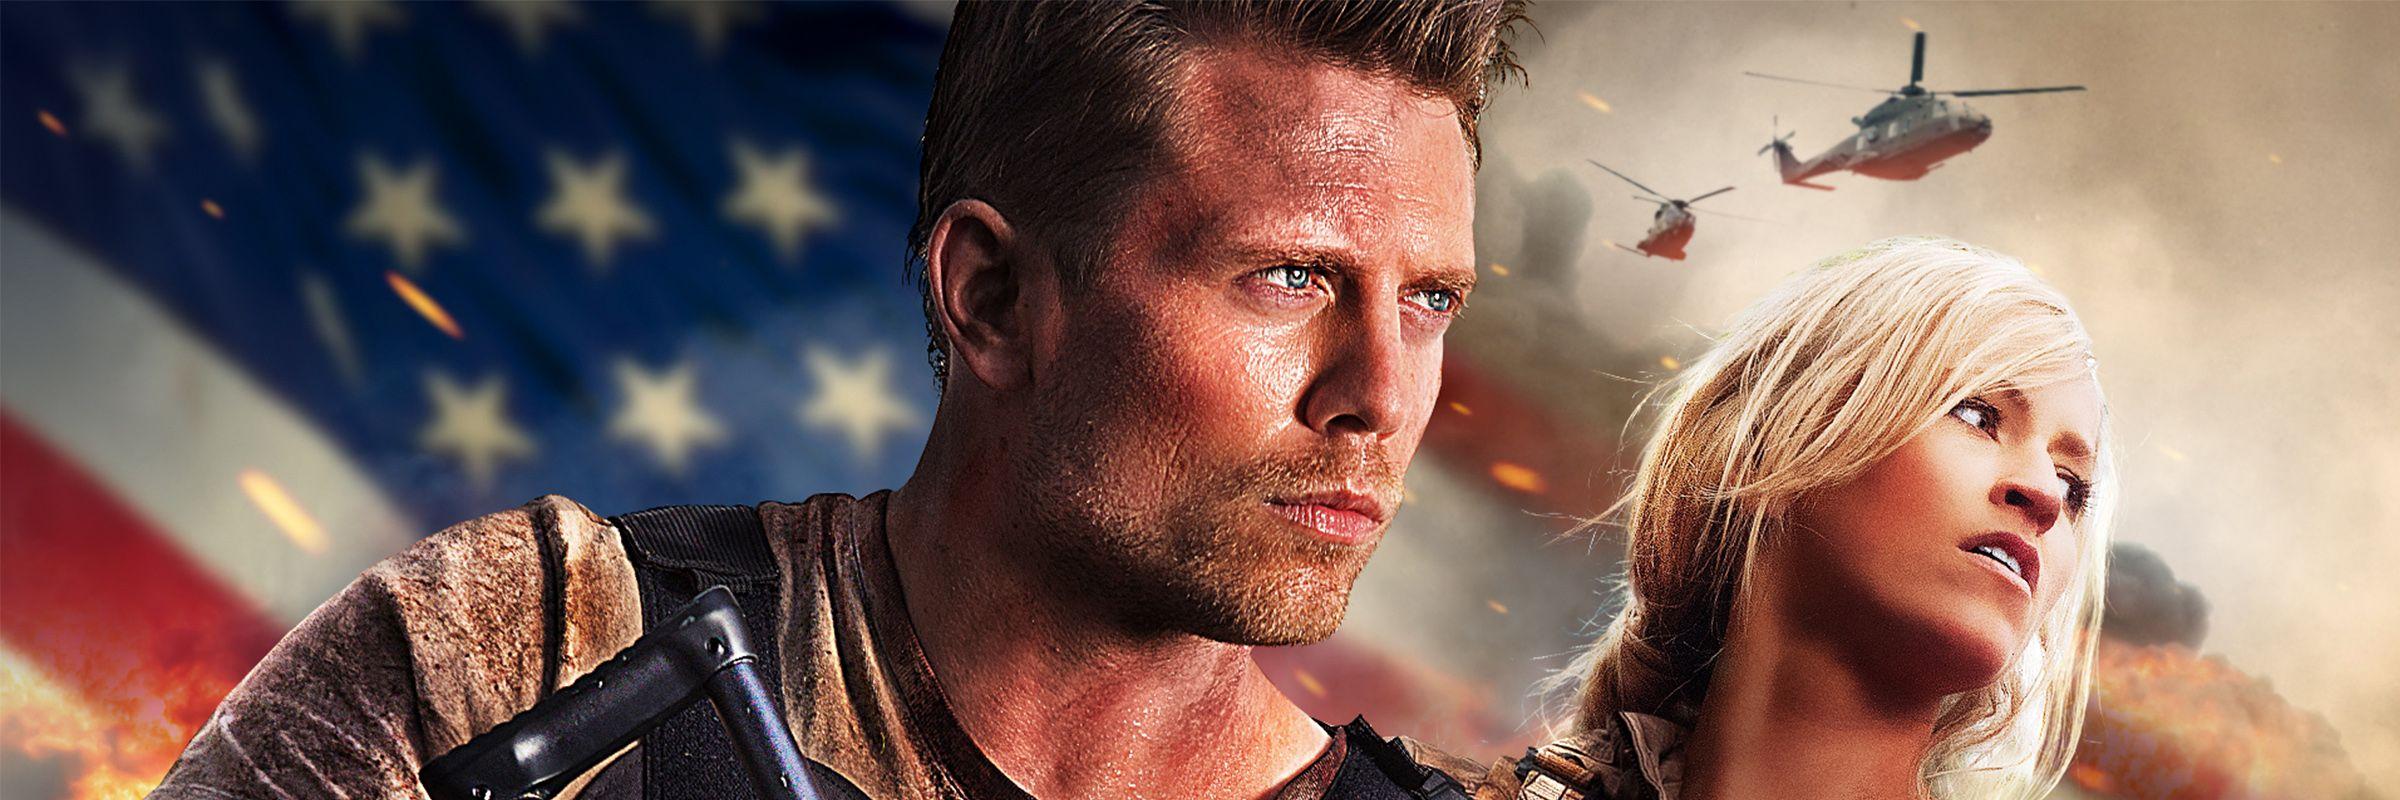 The Marine 4: Moving Target | Full Movie | Movies Anywhere